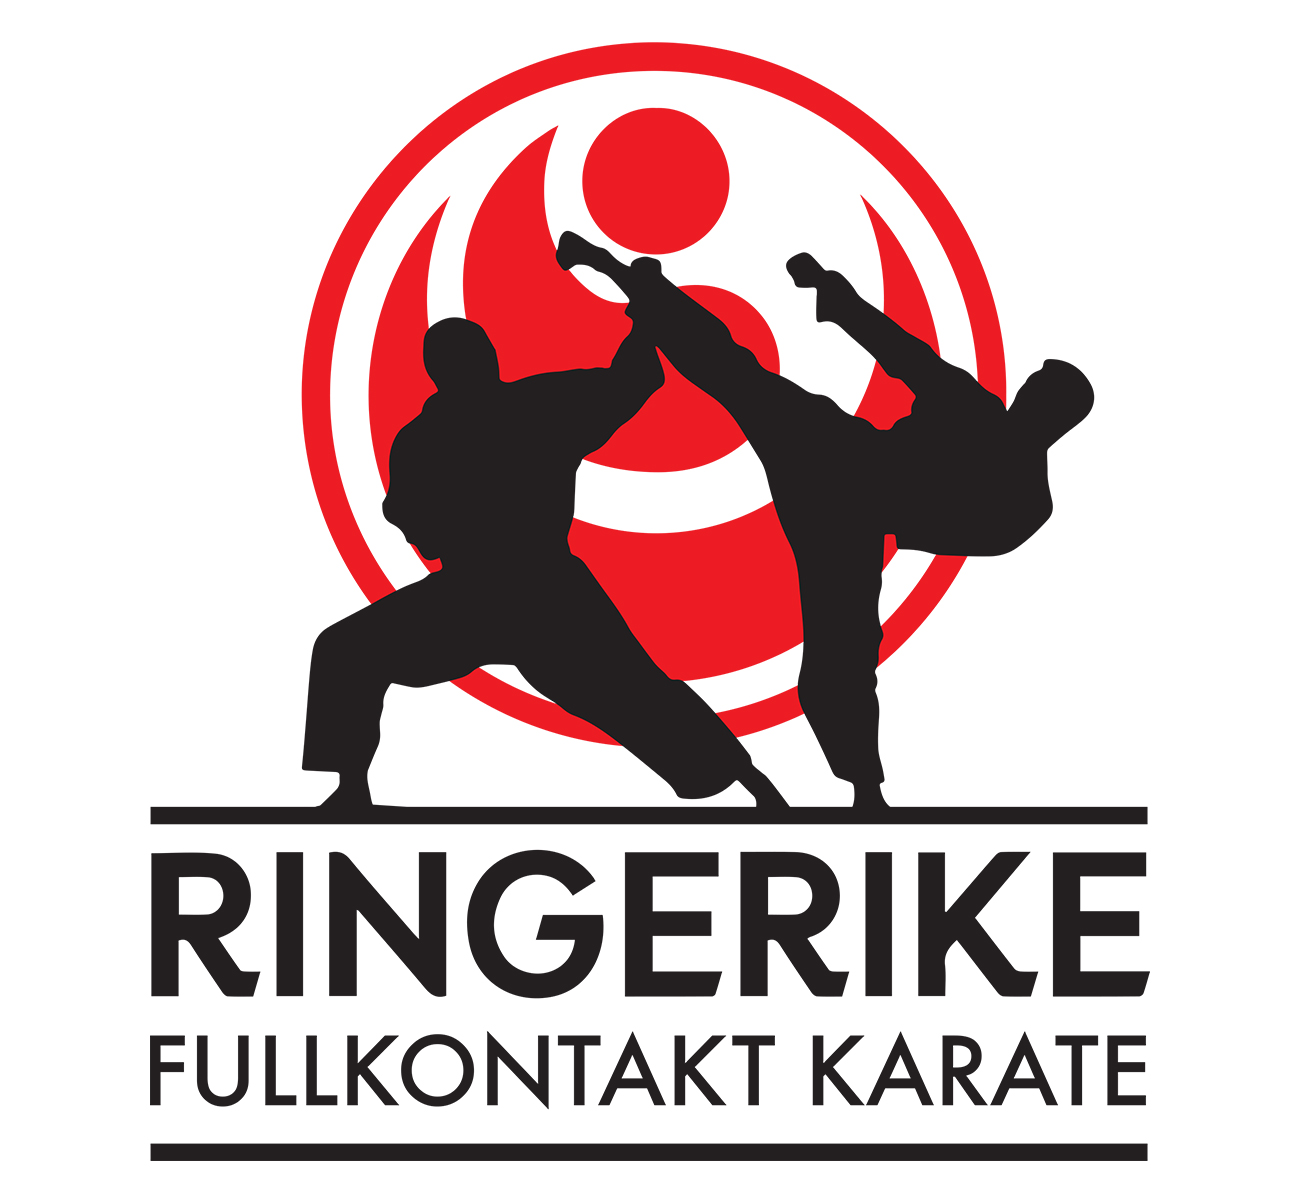 Ringerike Karateklubb logo